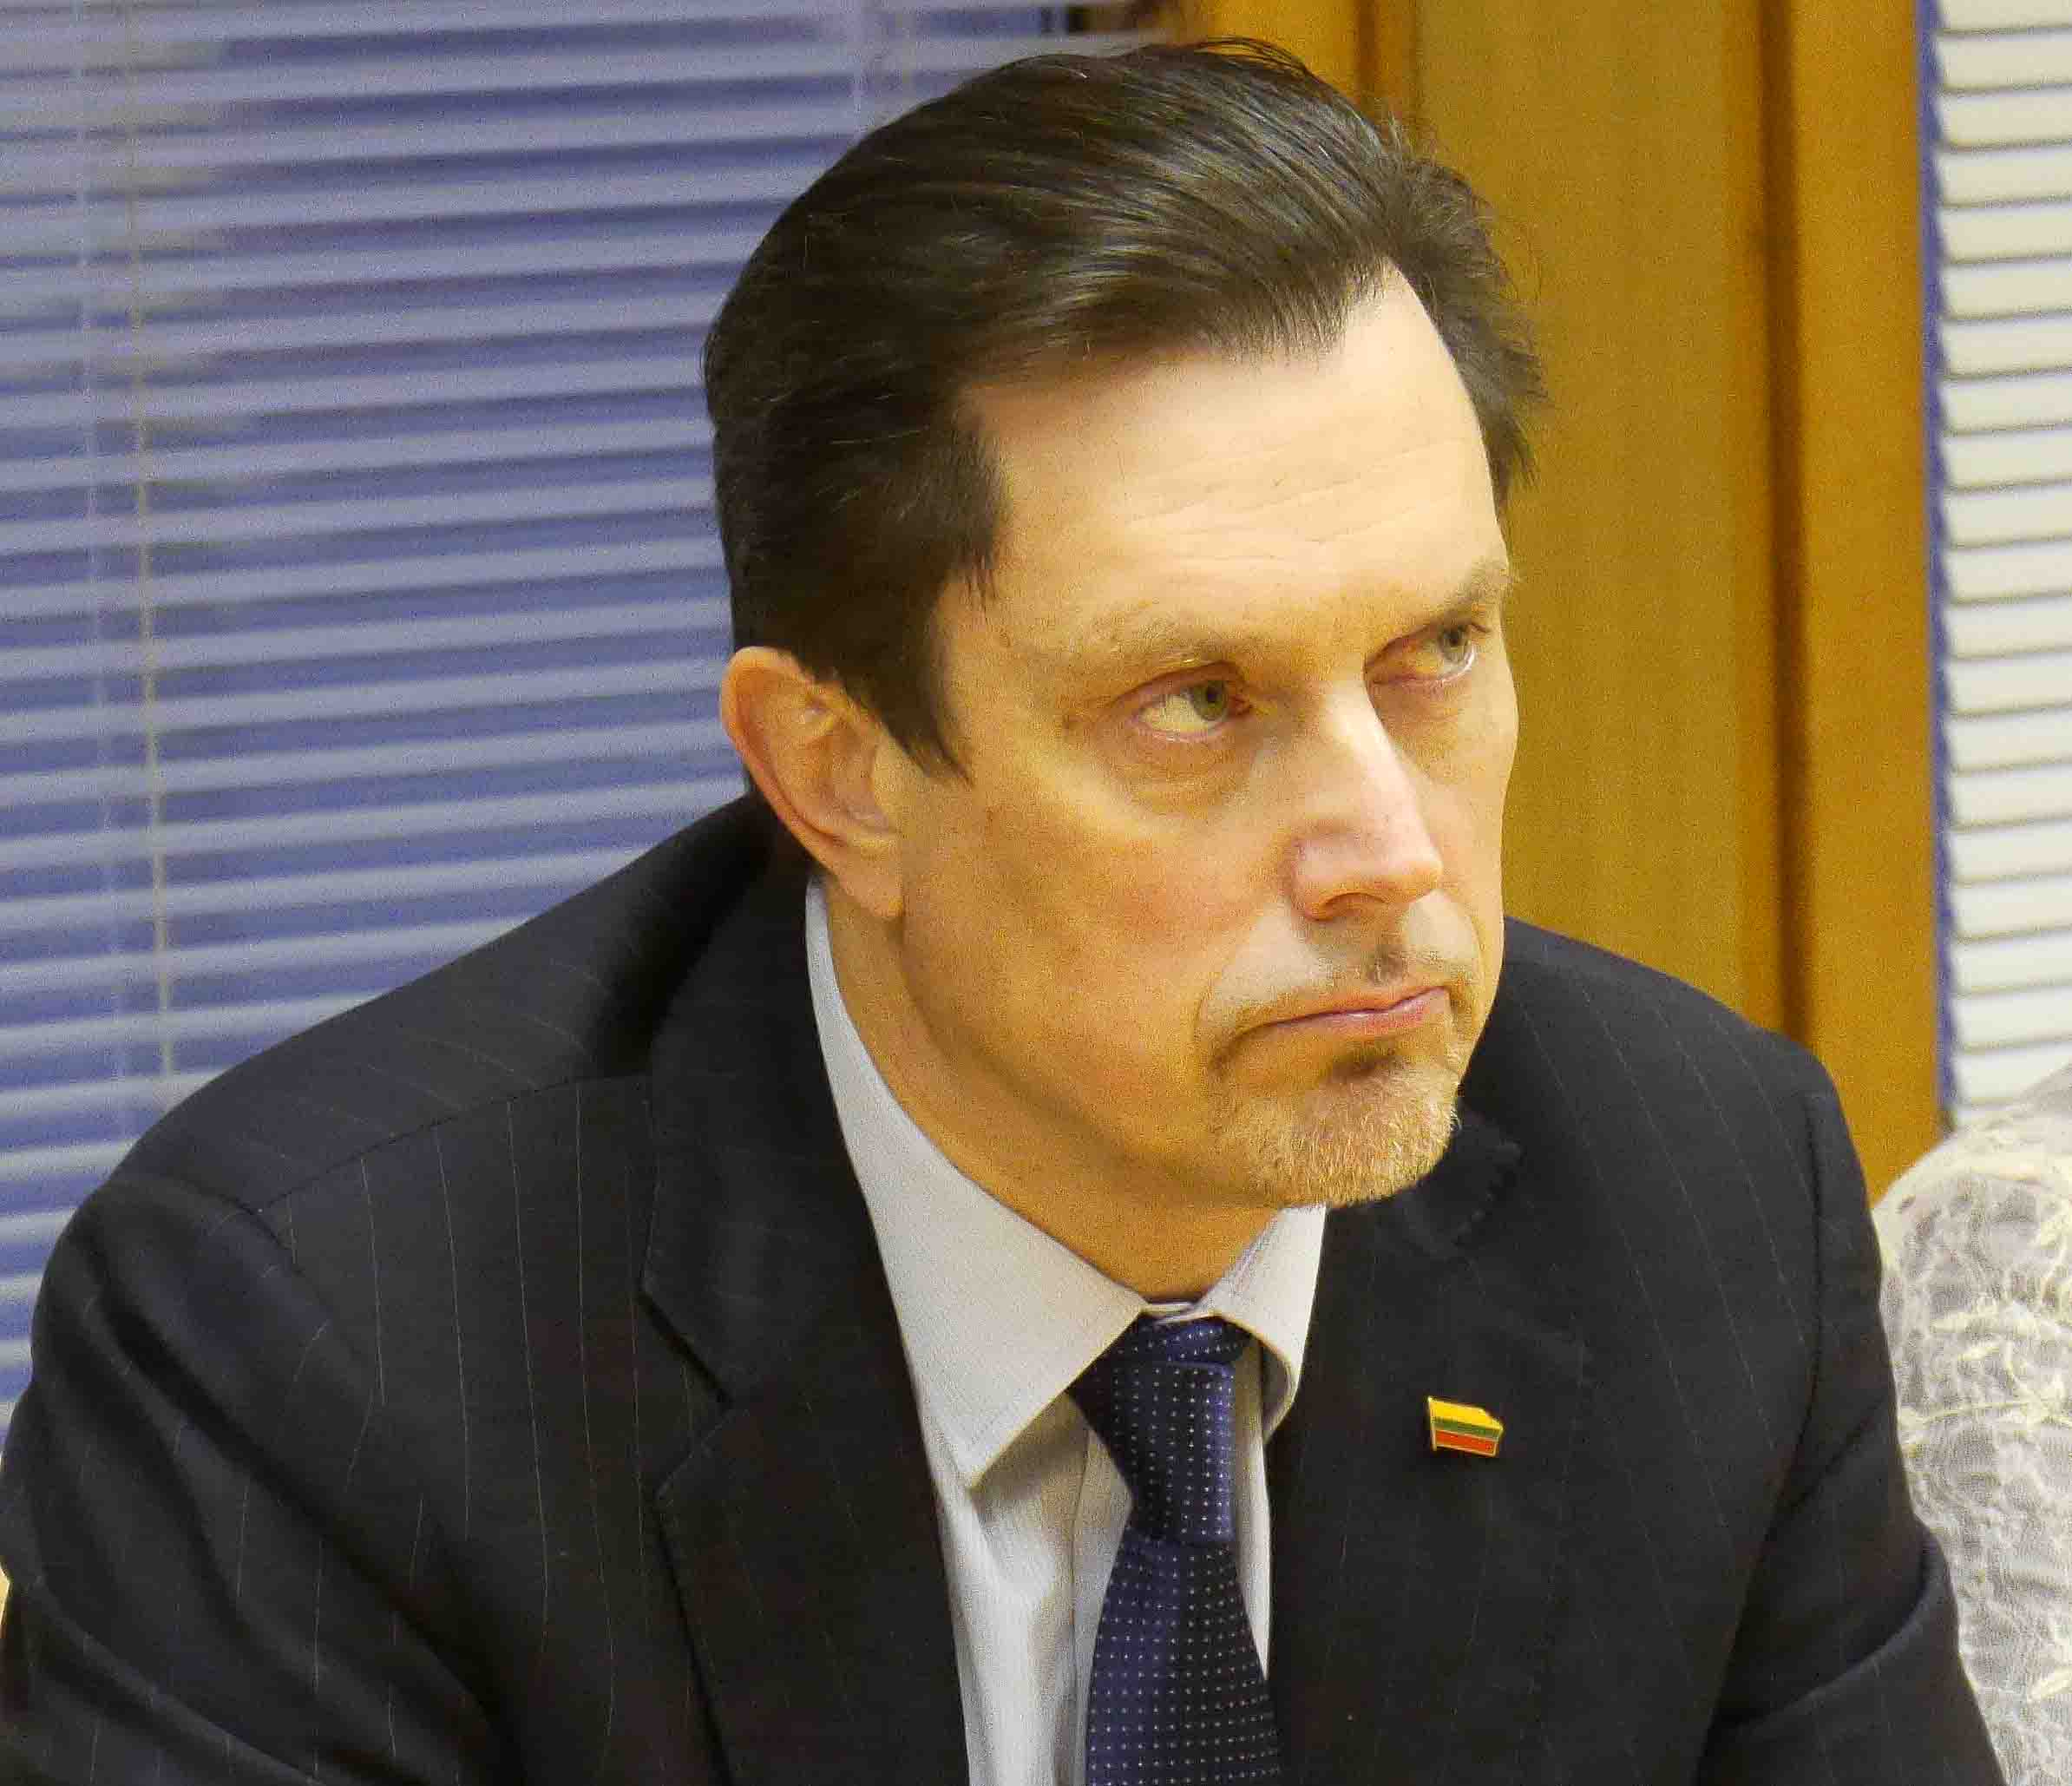 Vytautas Juozapaitis | Alkas.lt, J.Vaiškūno nuotr.